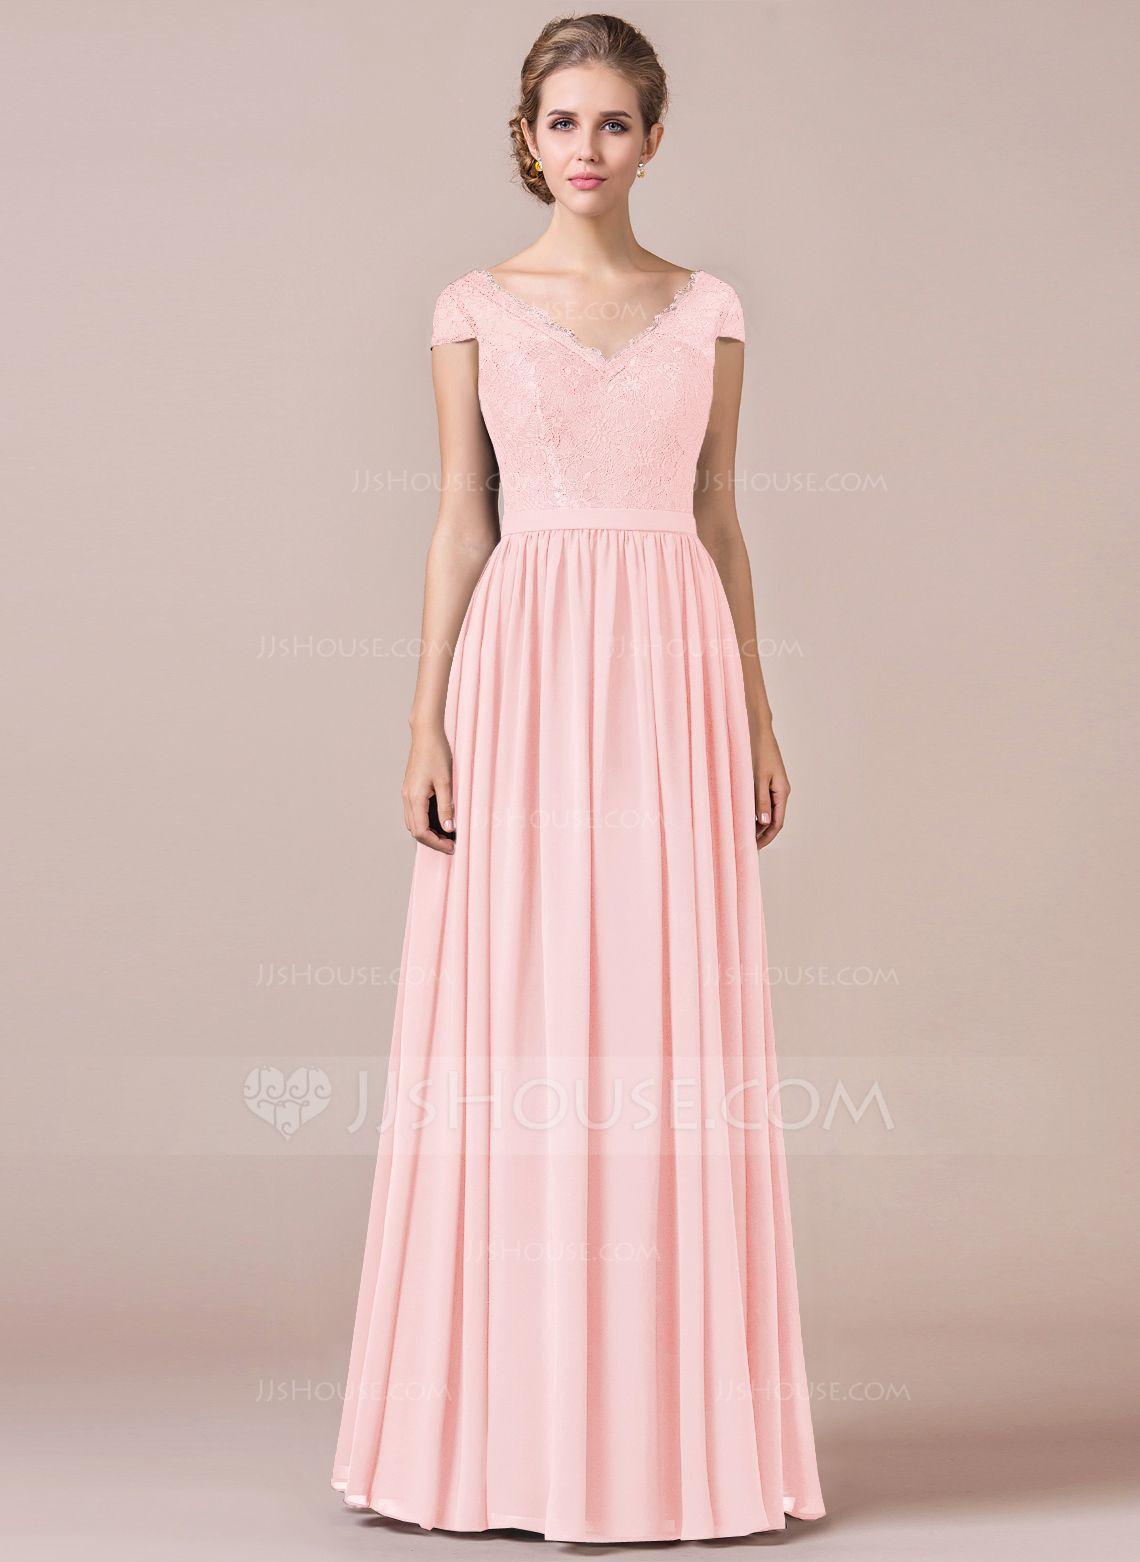 A-Line Cap Sleeve Floor-length Chiffon Bridesmaid Dress With Lace ...